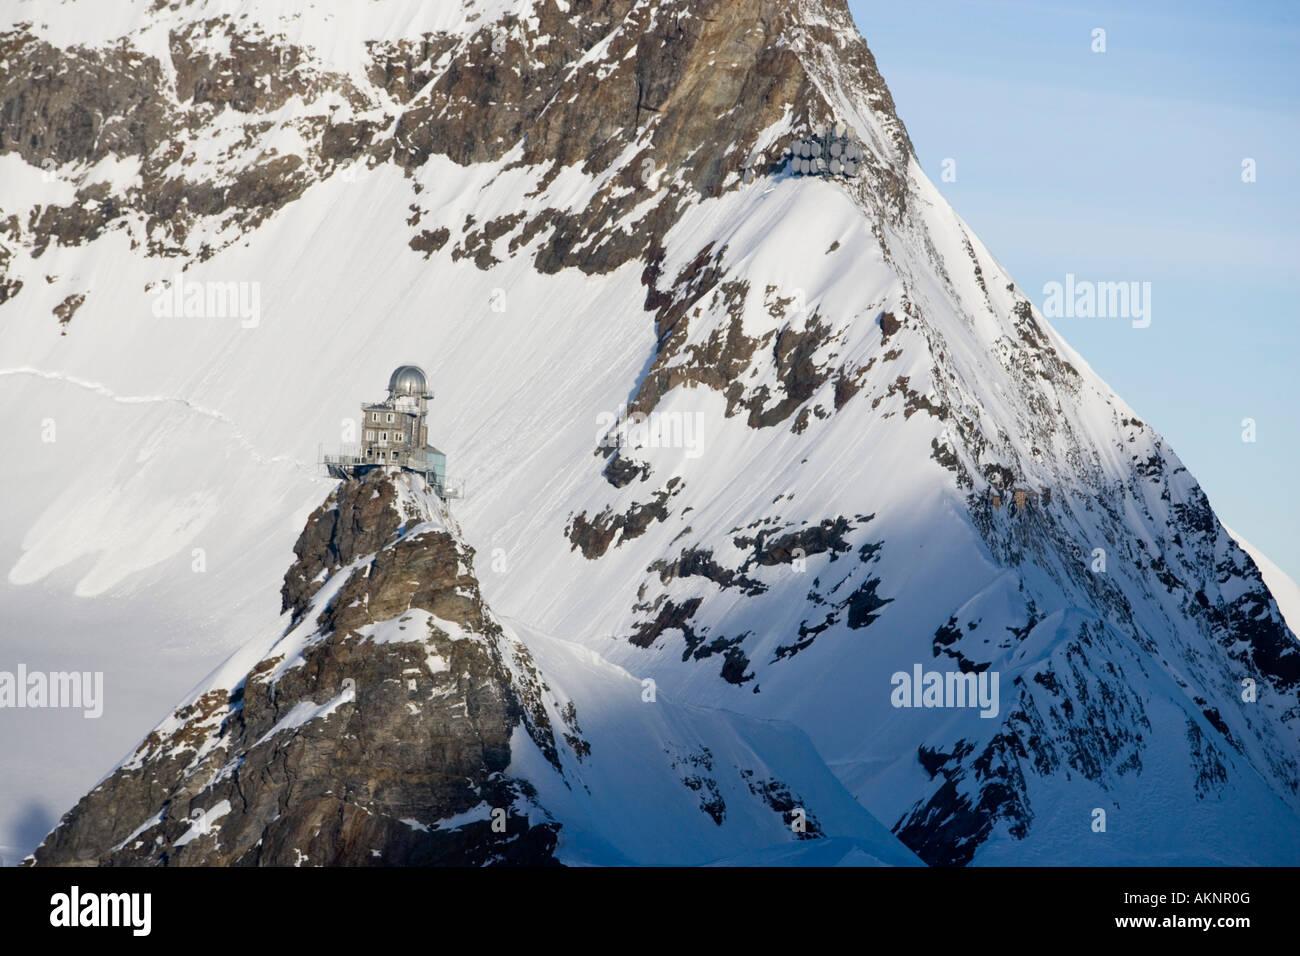 Sphinx Observatory Jungfraujoch Top of Europe Aletsch